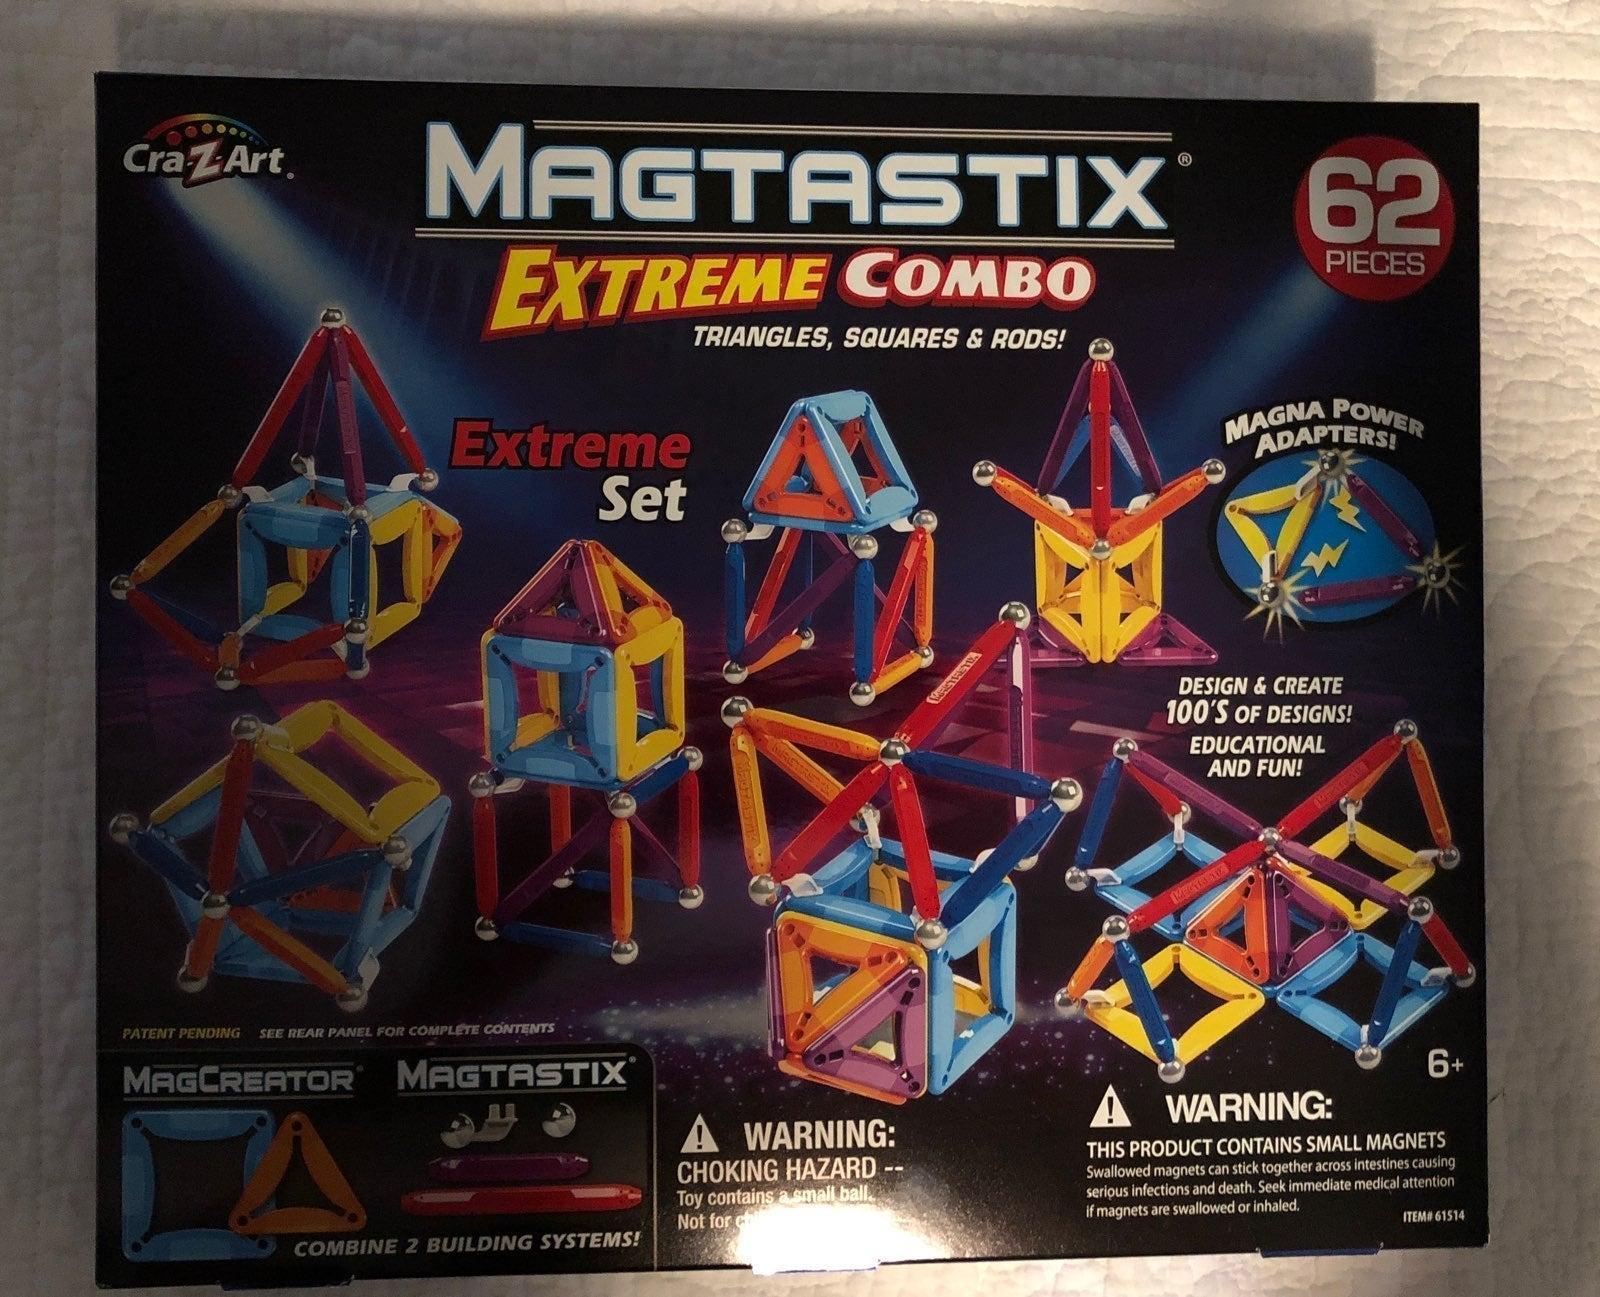 Magtastix 62 Piece Set